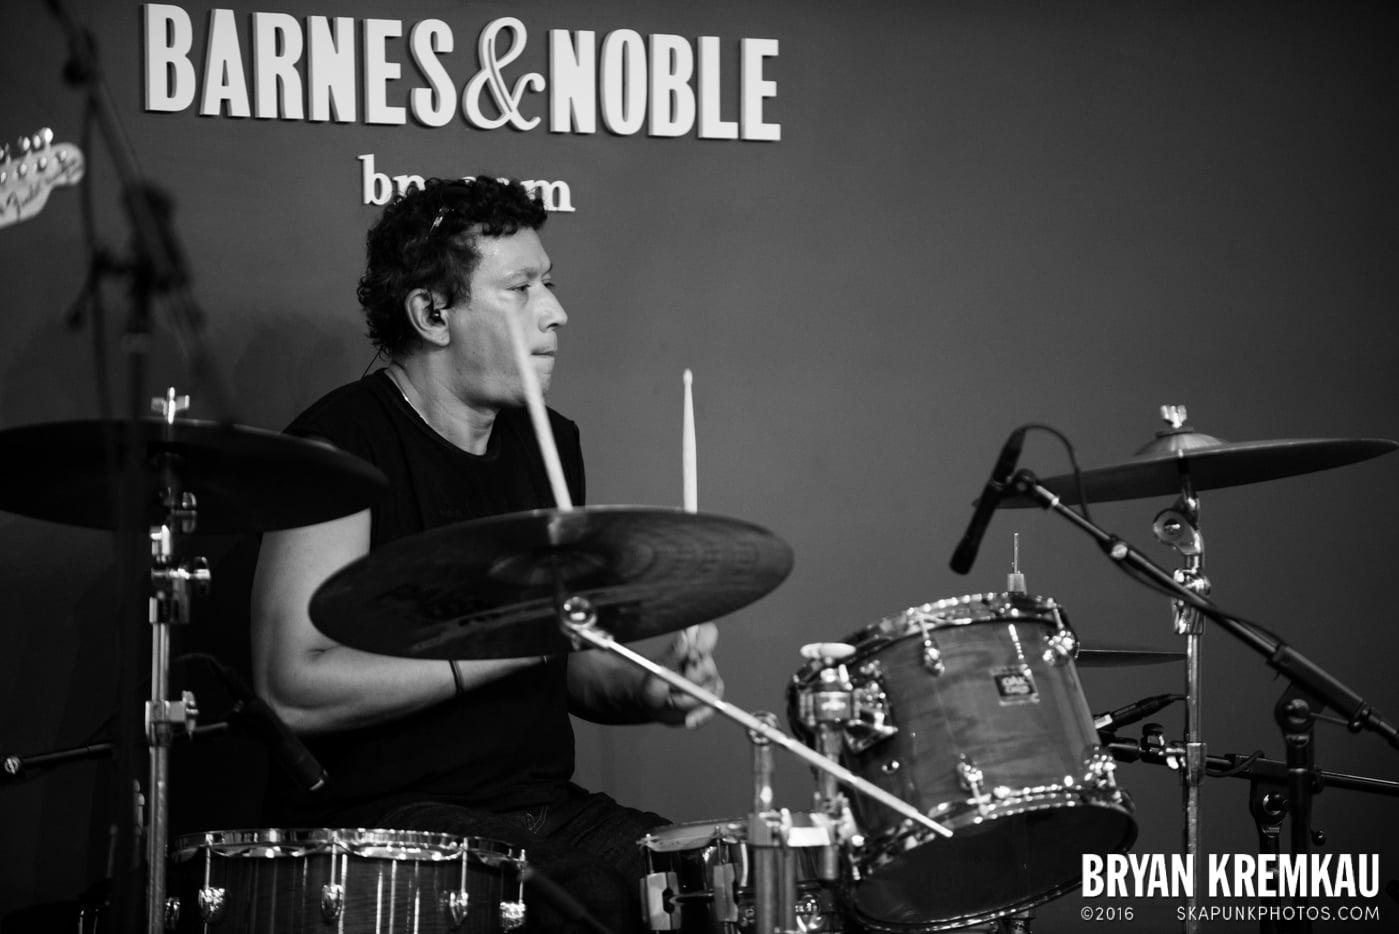 Willie Nile @ Barnes & Noble: Union Square, NYC - 6.25.13 (15)